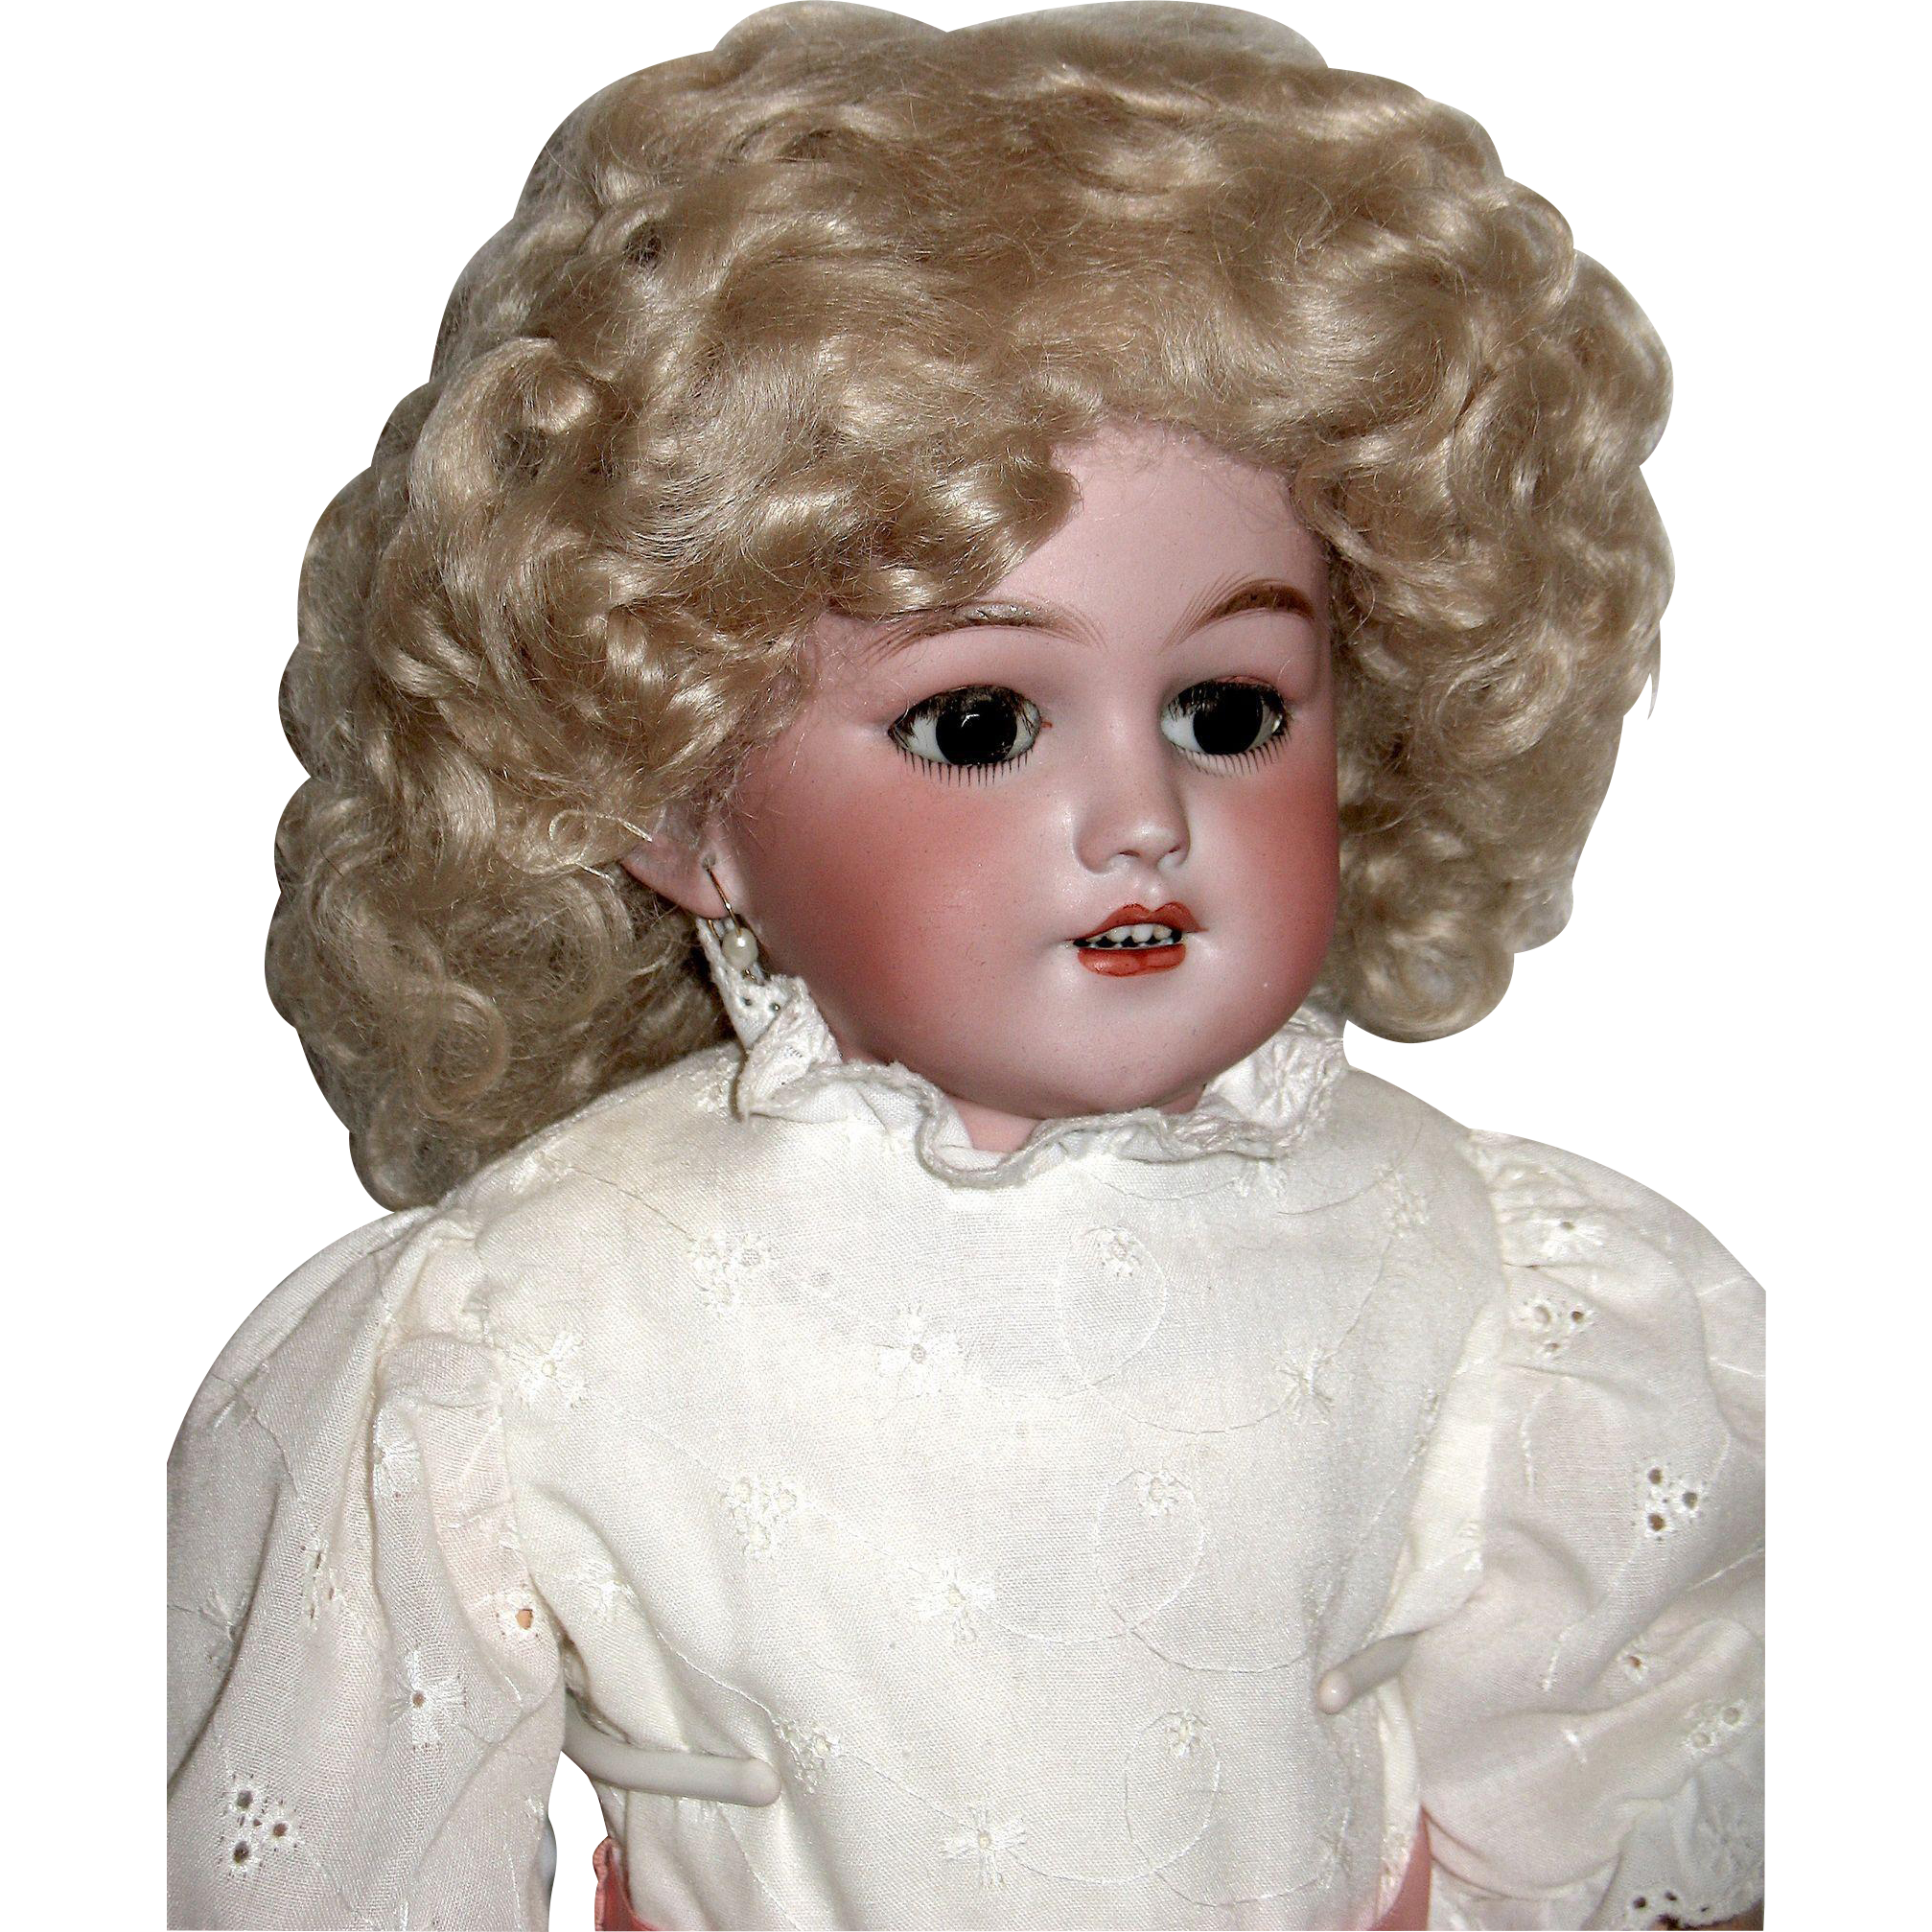 Rare Simon Halbig 1250 Shoulder Head Doll Version of Santa 1249 Bisque Head Doll